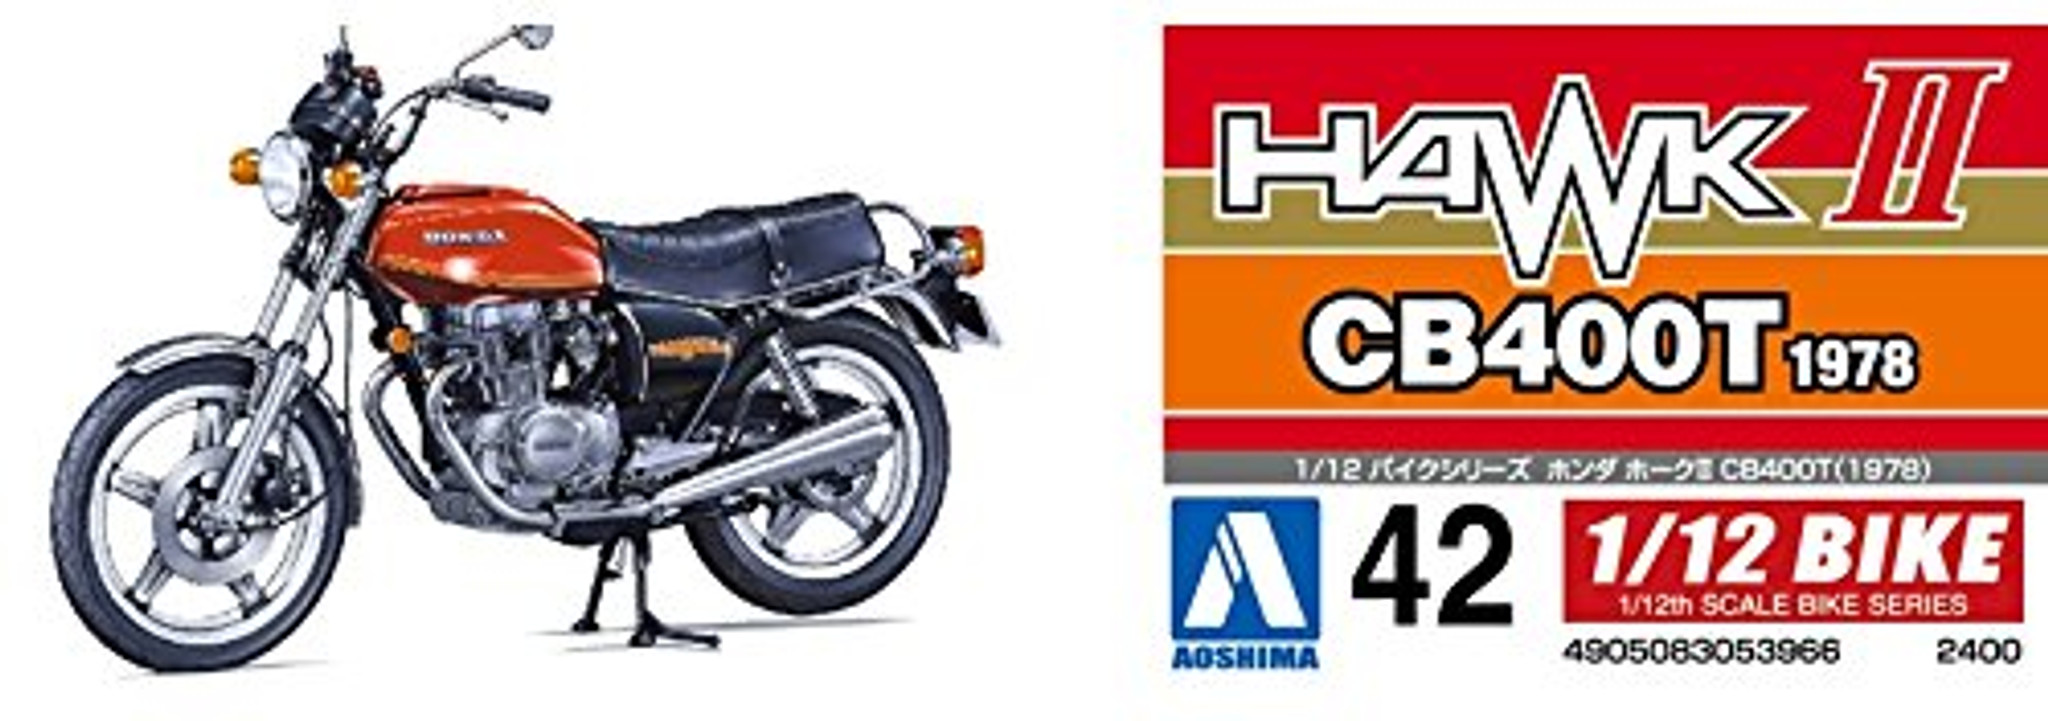 small resolution of  aoshima 53966 bike 42 honda hawk ii cb400t 1 12 scale kit